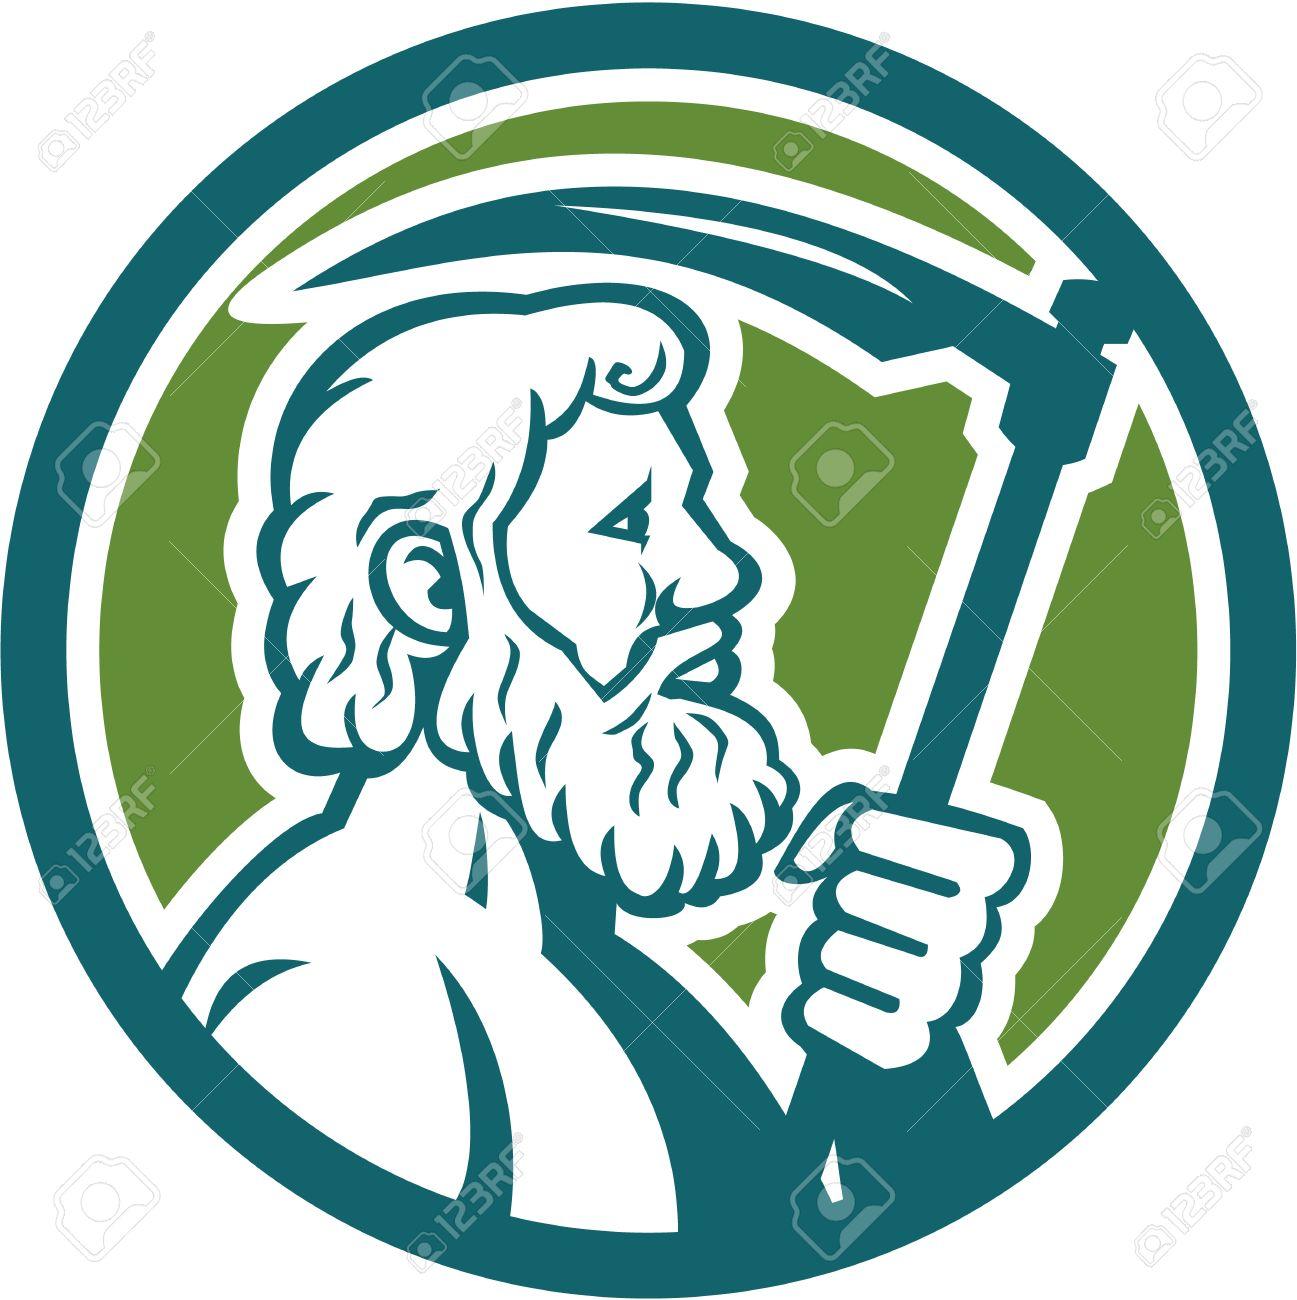 Illustration of cronus or kronos greek god and leader of titans illustration of cronus or kronos greek god and leader of titans holding a scythe buycottarizona Images